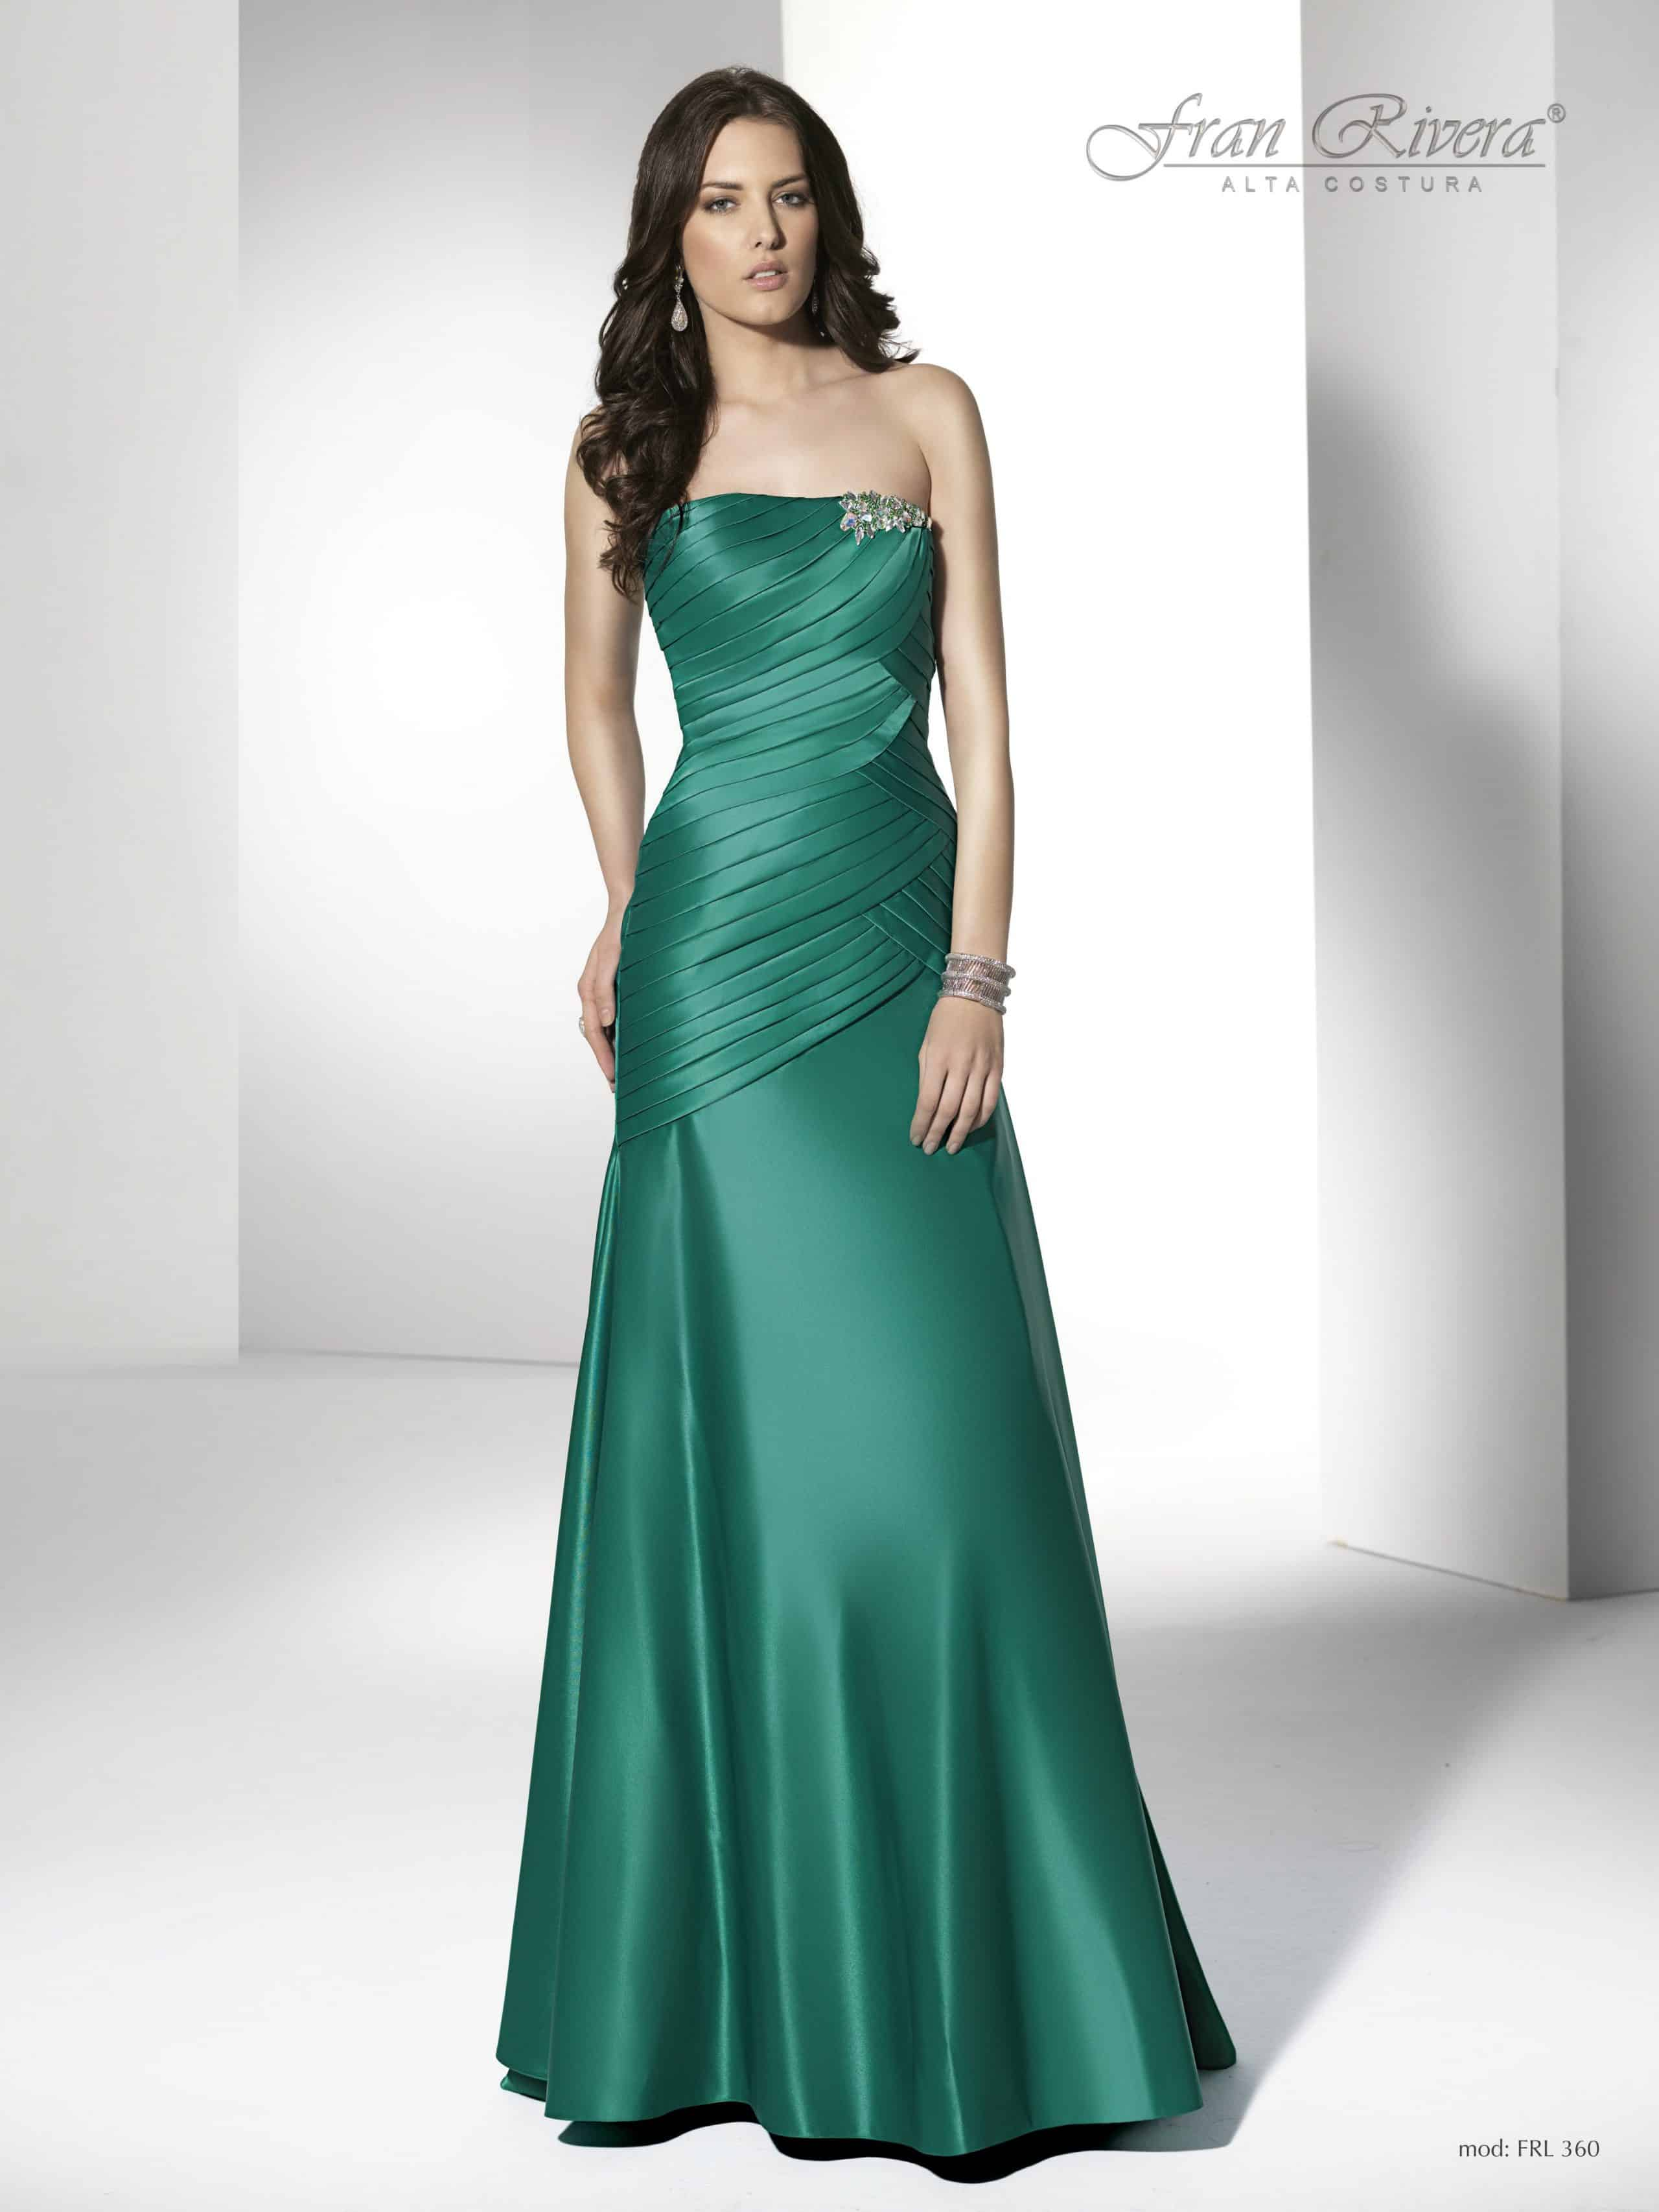 Mujer bonita vestidos once